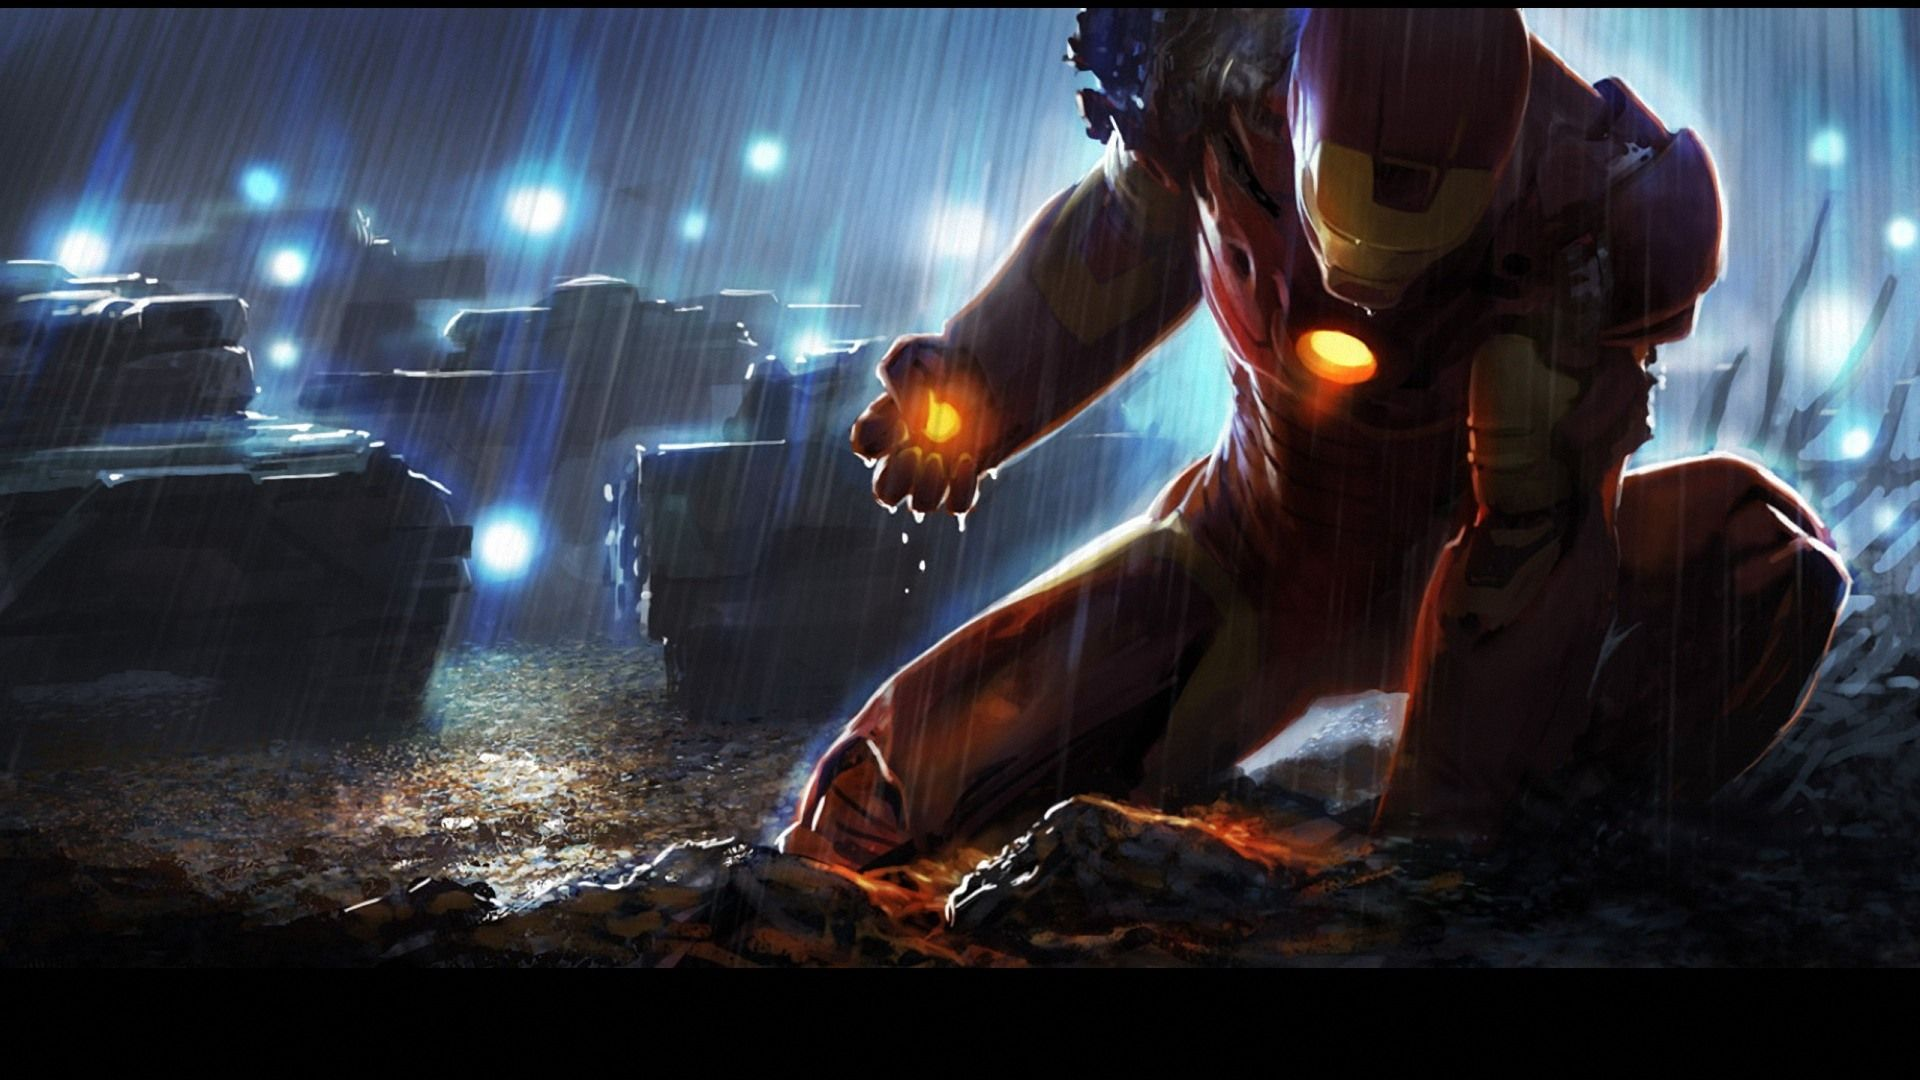 Iron Man Art Hd Desktop Wallpapers Free Desktop Wallpaper 1920x1080